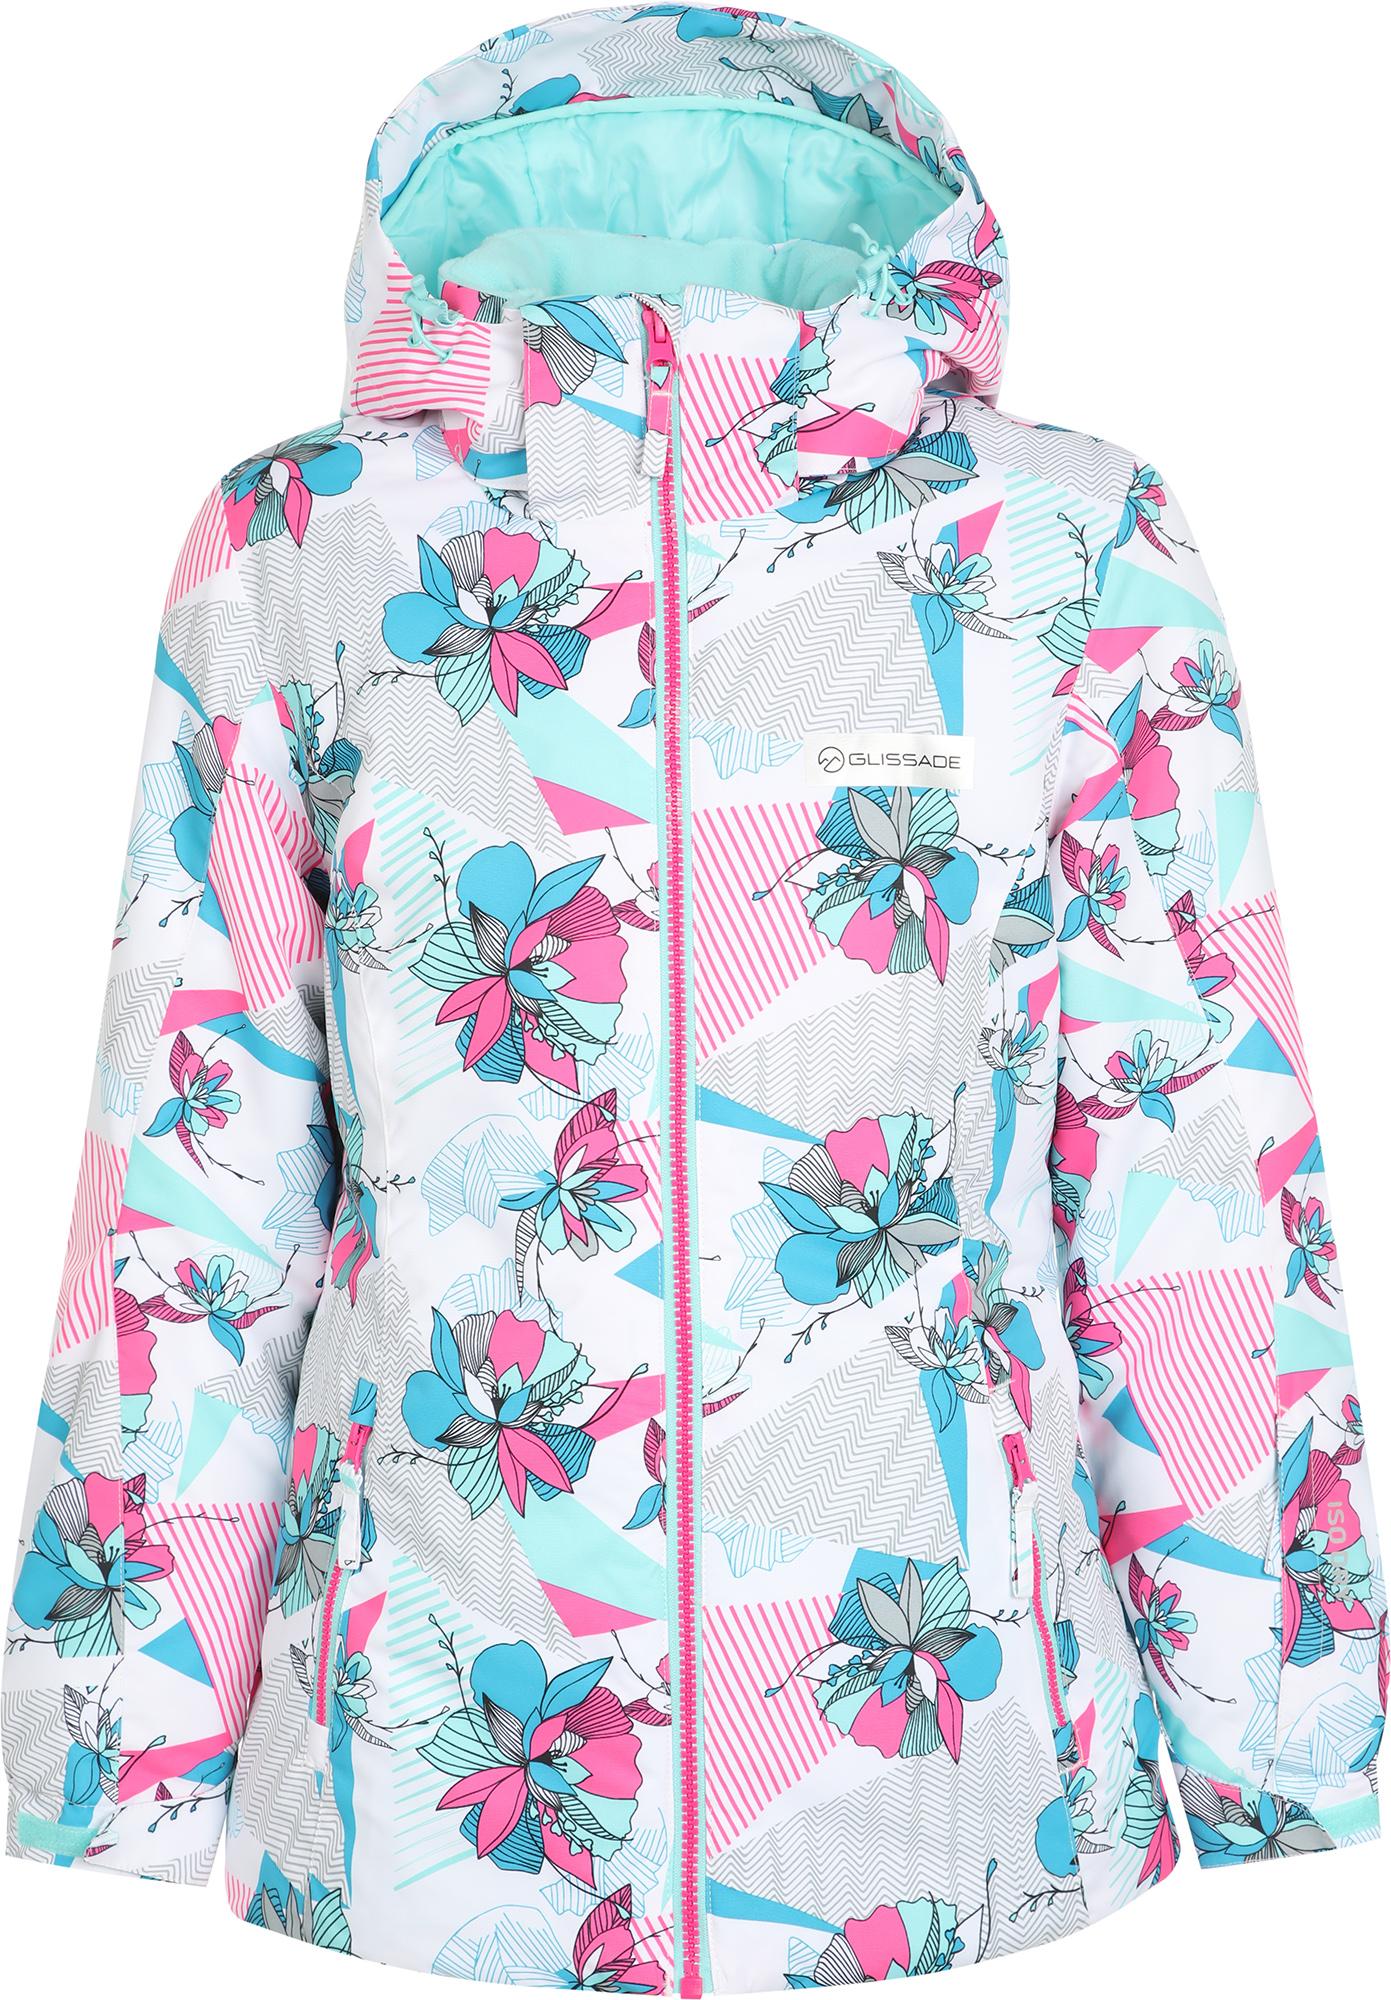 Glissade Куртка утепленная для девочек Glissade, размер 158